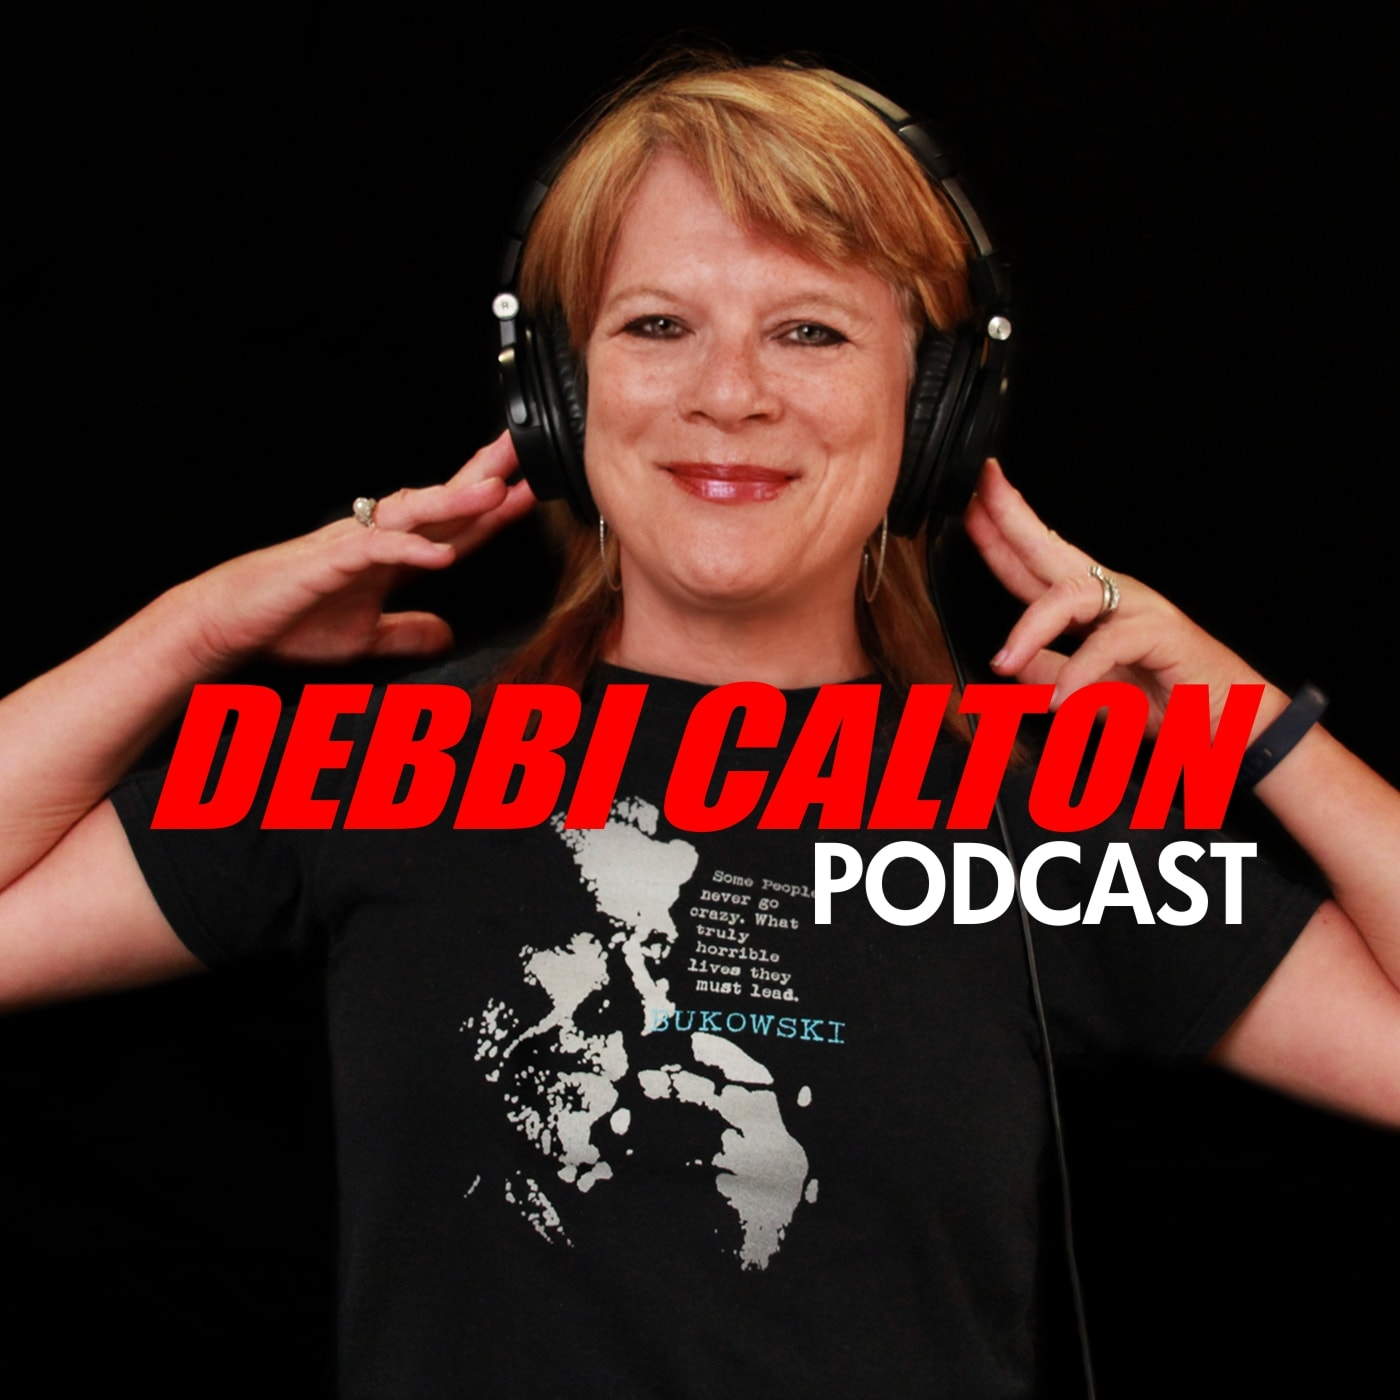 Debbi Calton Podcast